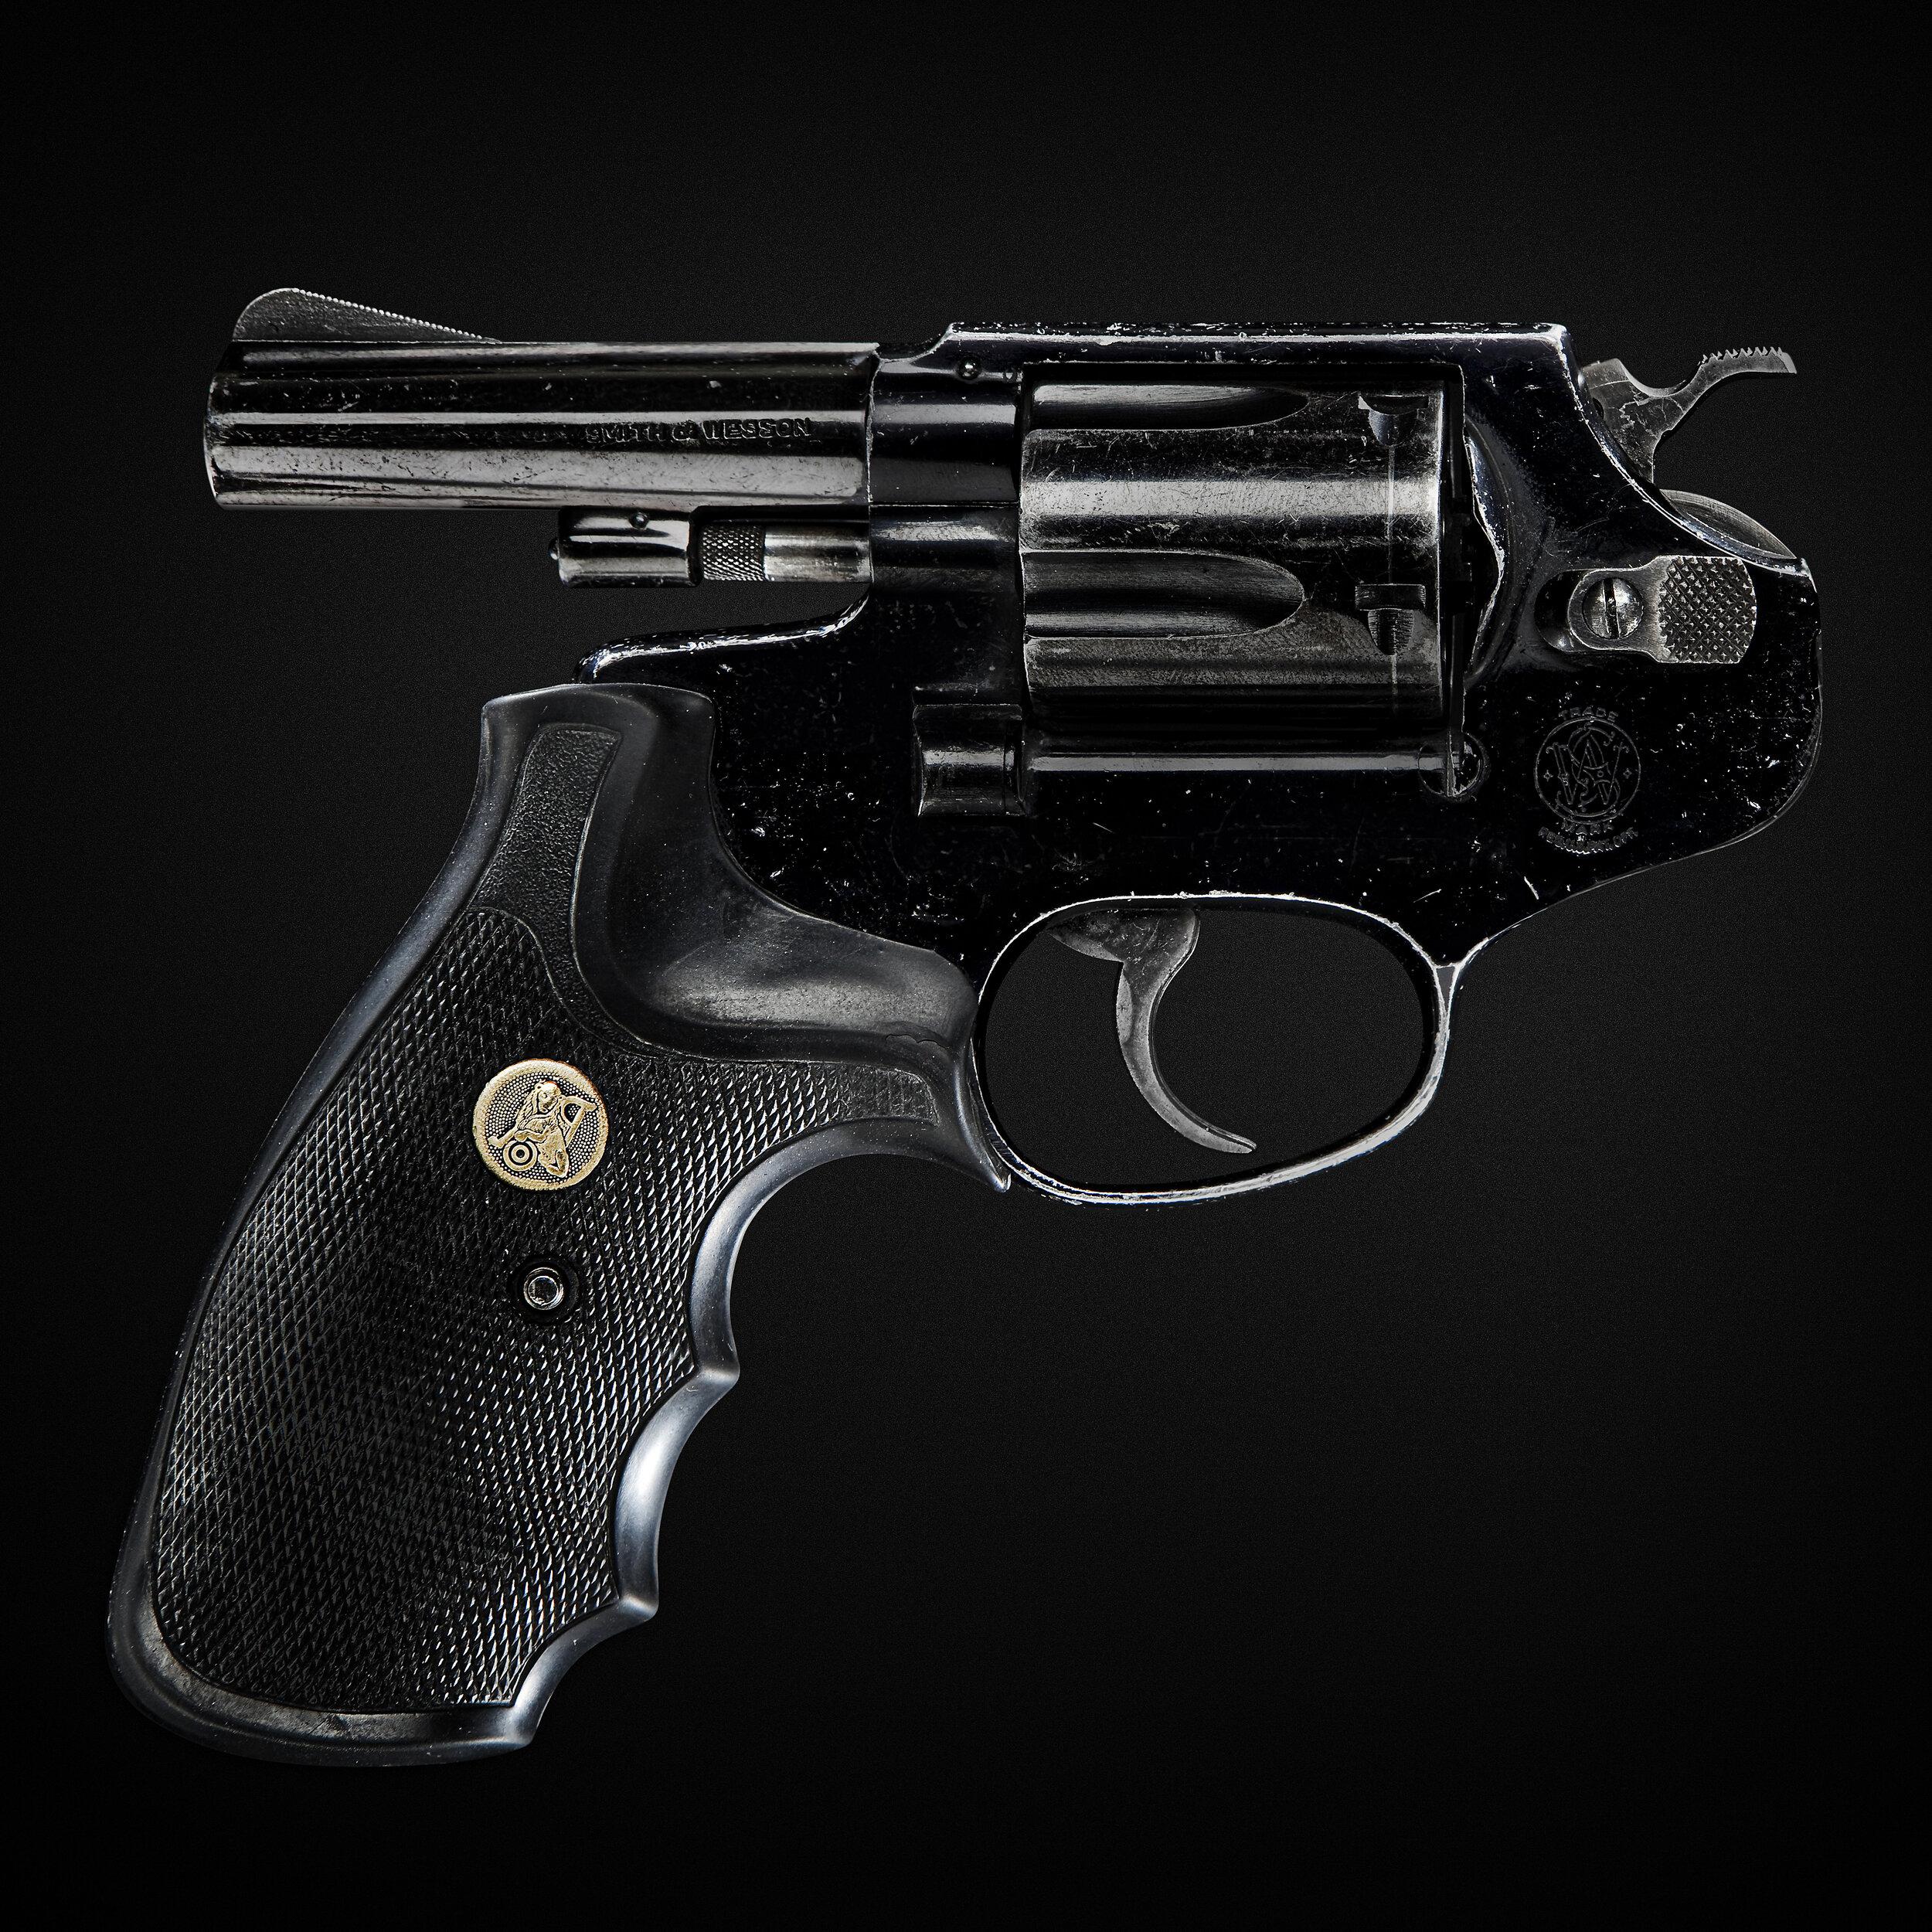 RW_Guns_3193_master.jpg